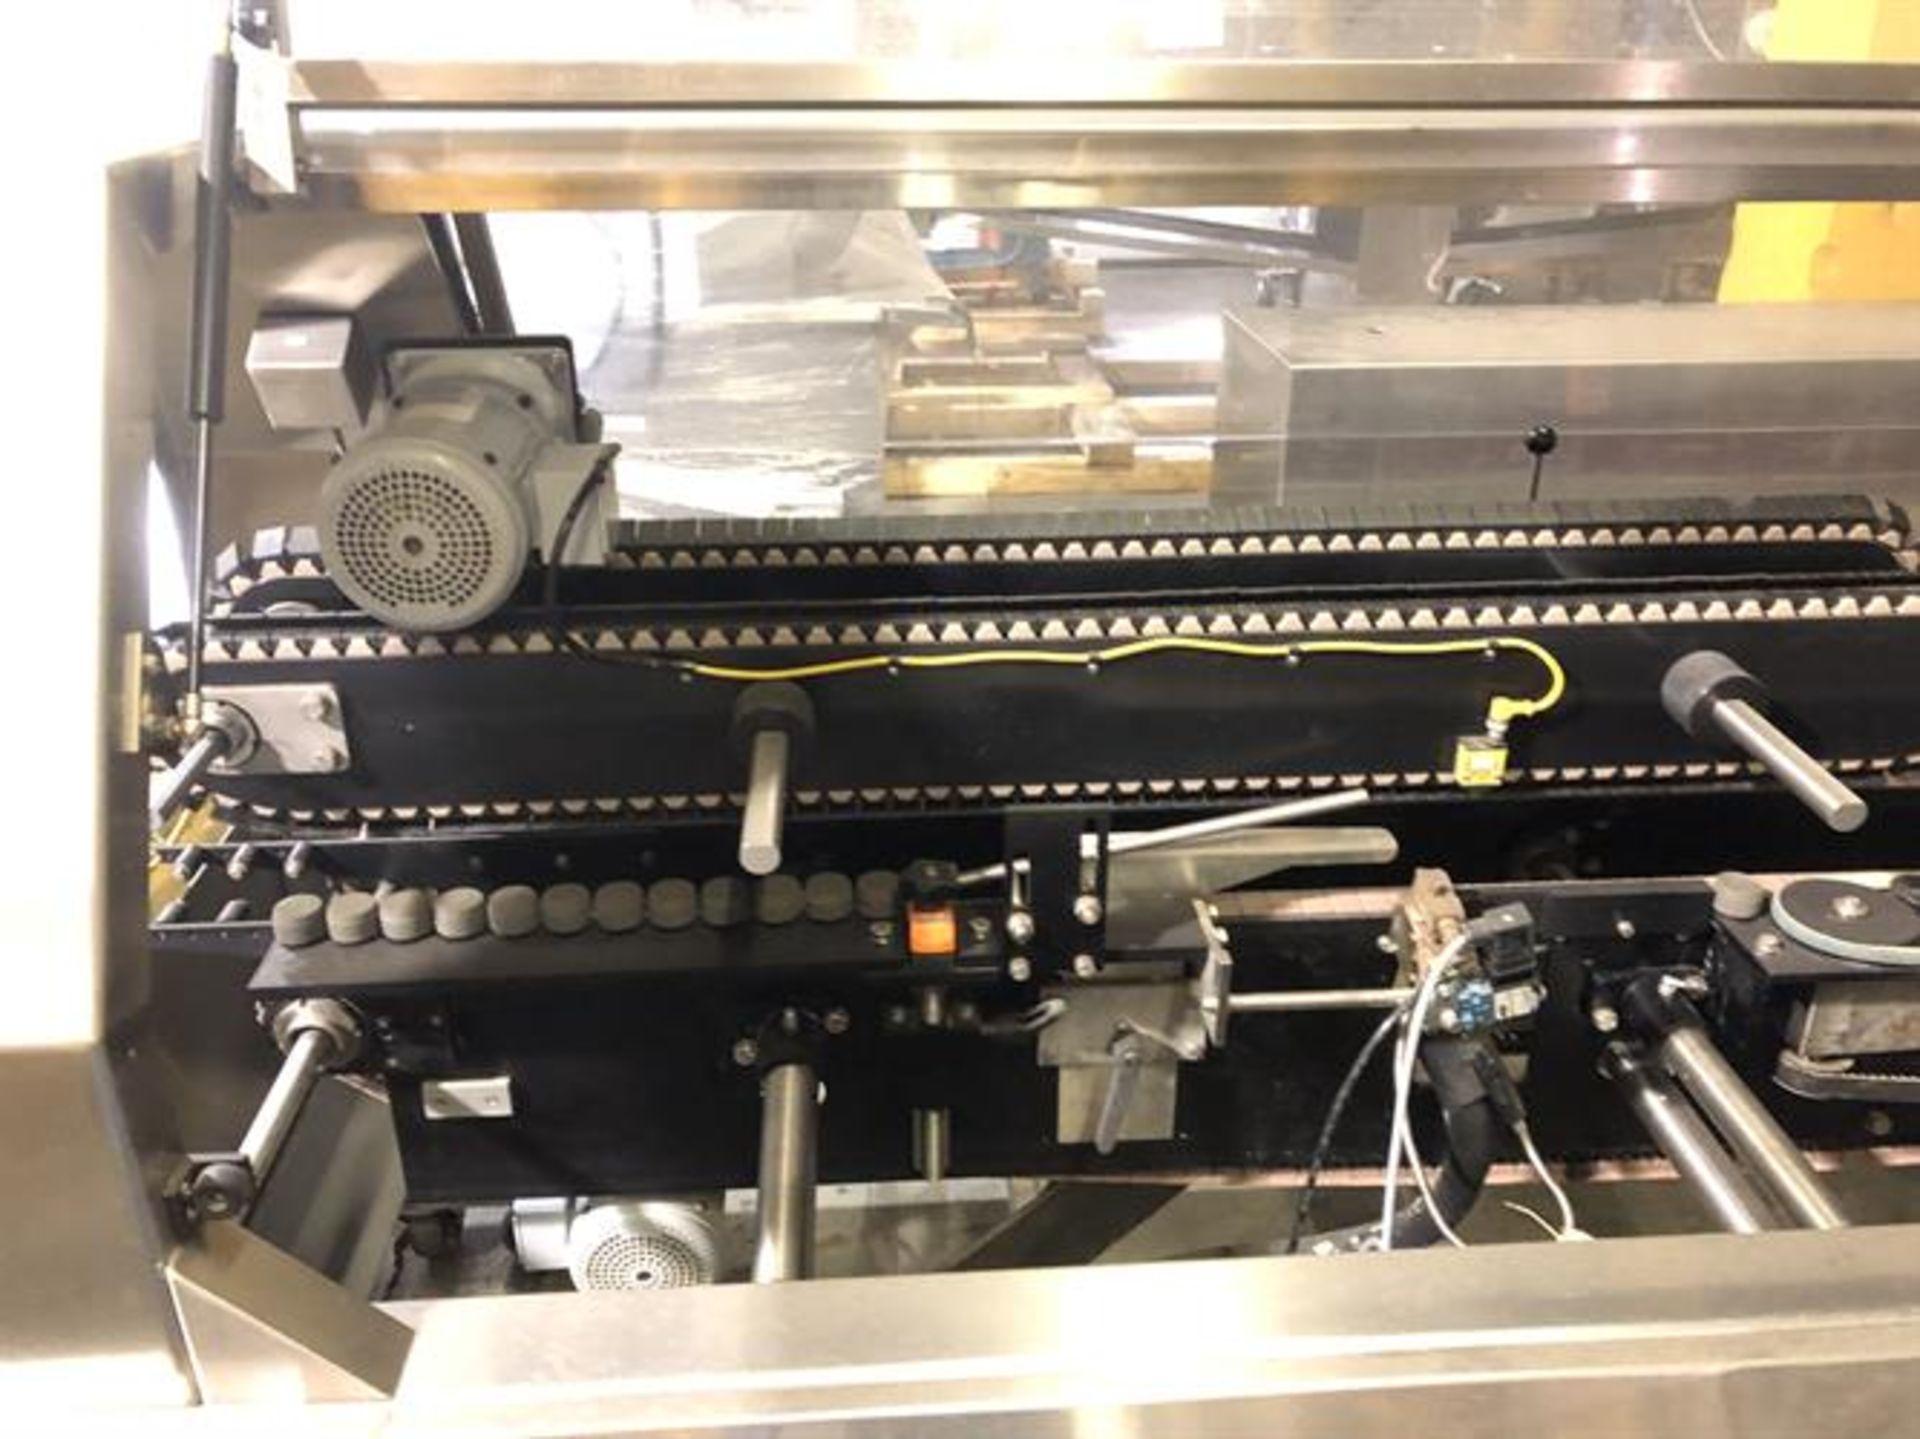 Bradman Lake inline Top Flap Sealer carton closer - Nordson Hot Melt - Allen Bradley Panelview - Image 7 of 19